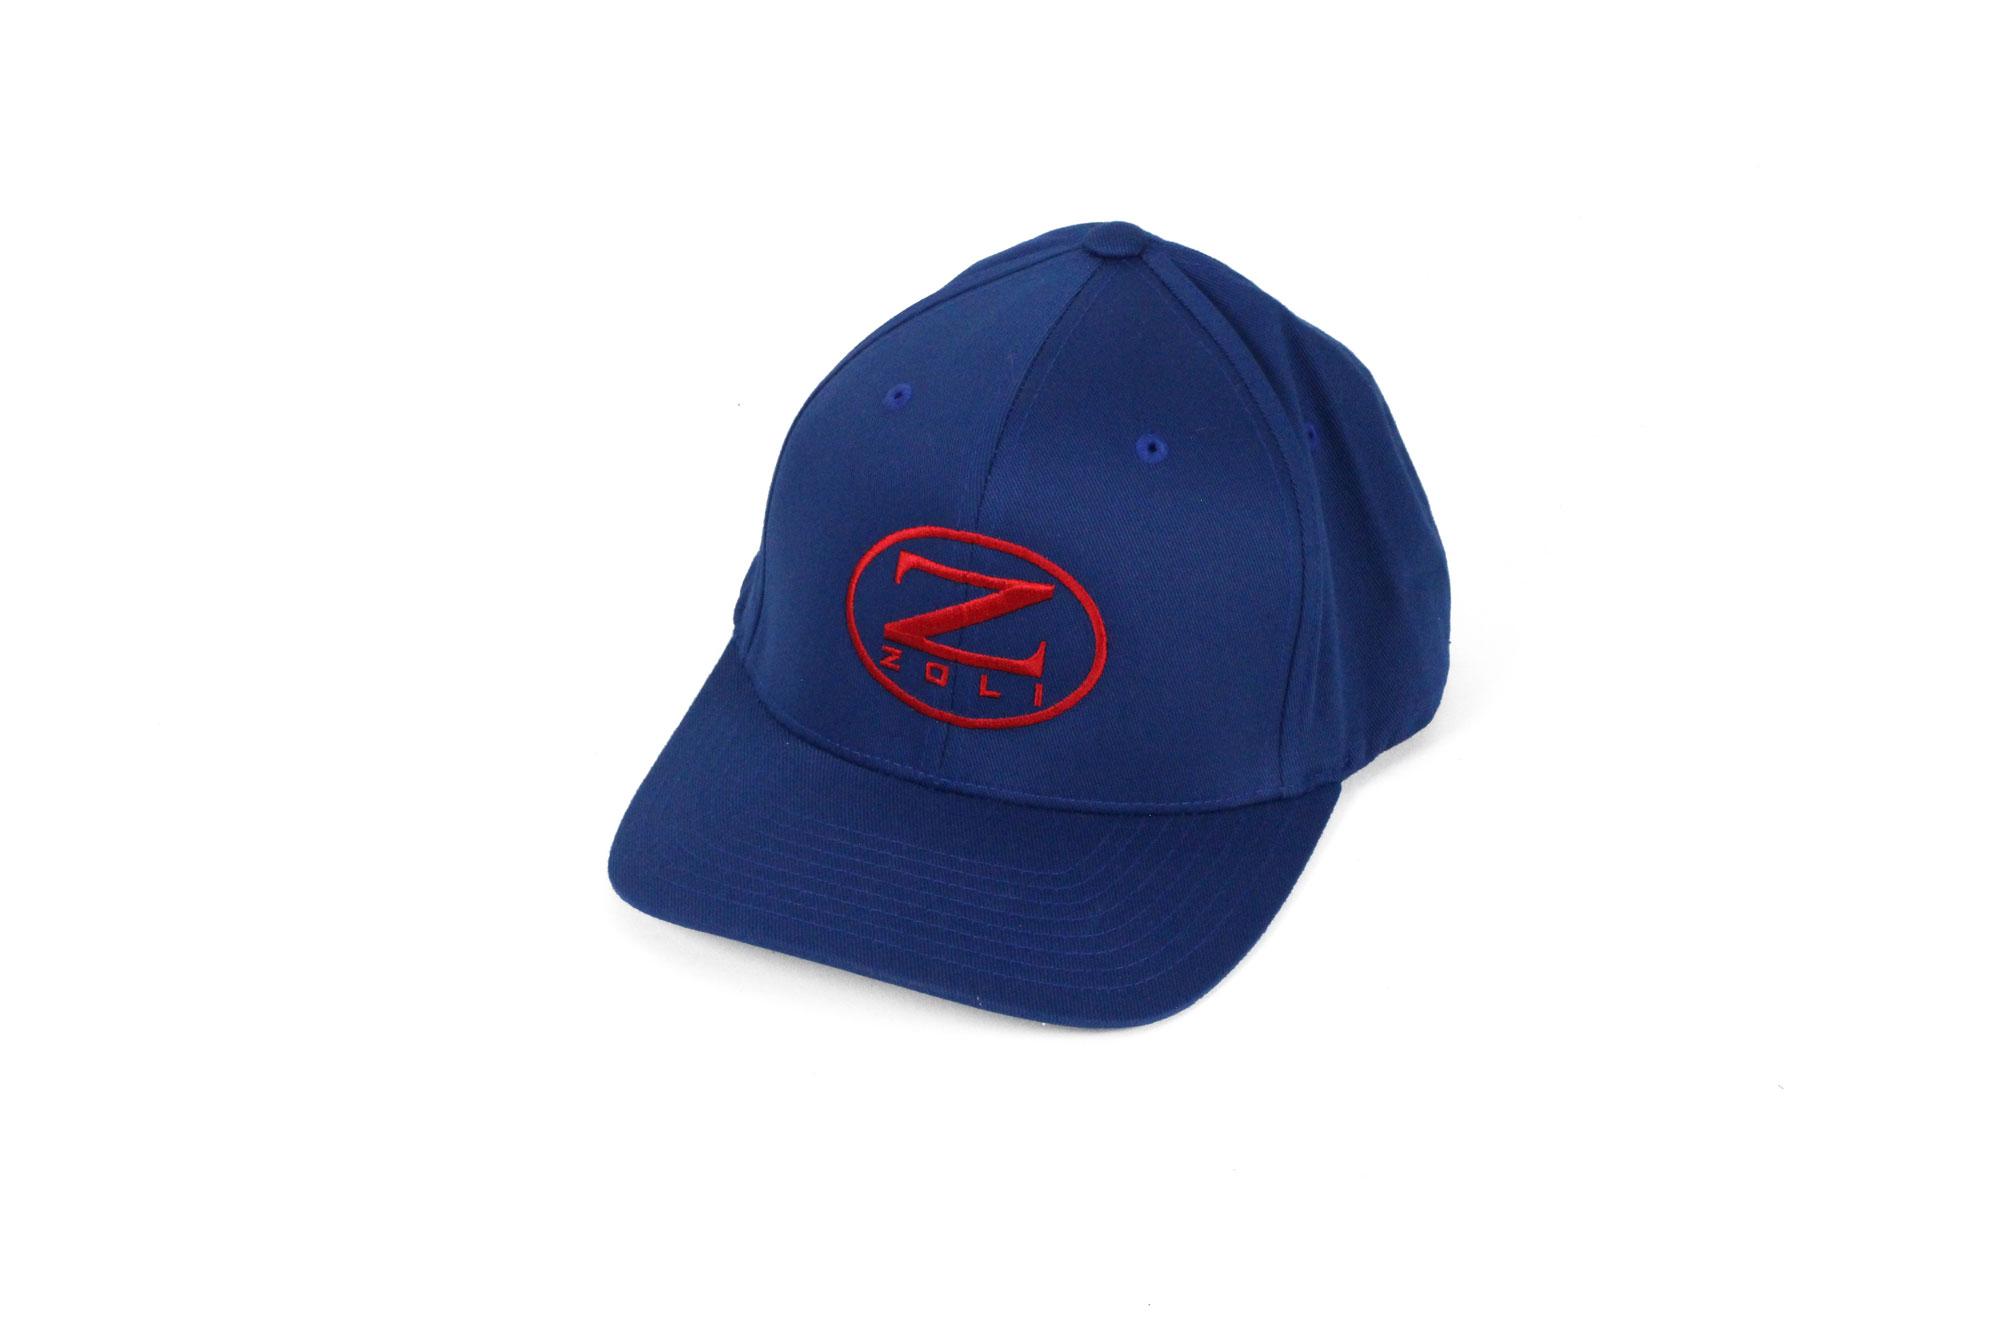 Zoli Embroidered Flexfit® Hat (Royal Blue)